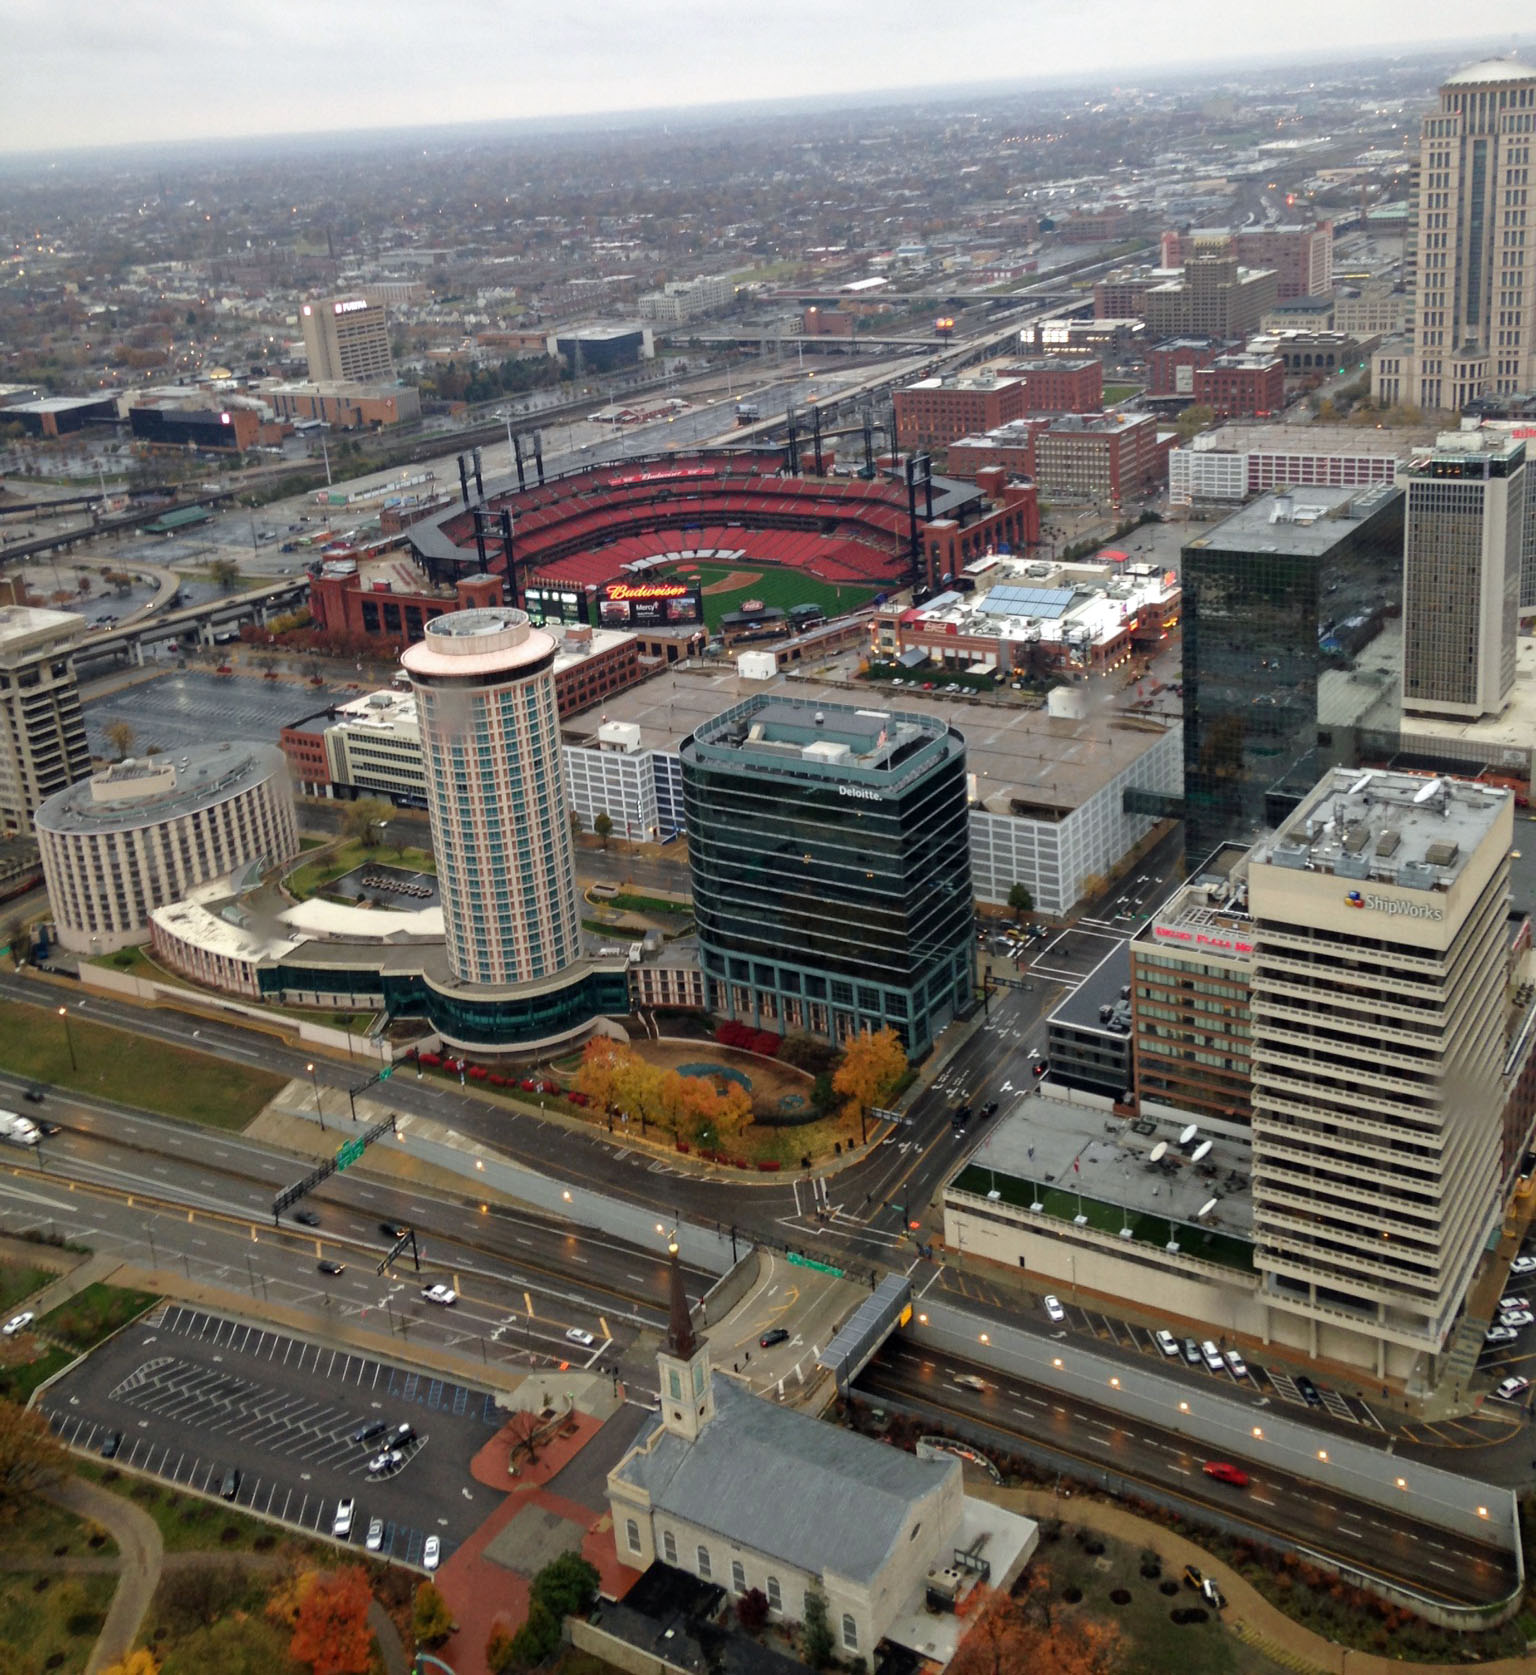 Gateway Arch, St. Louis, Missouri, thrill, ride, view, Mississippi, Illinois